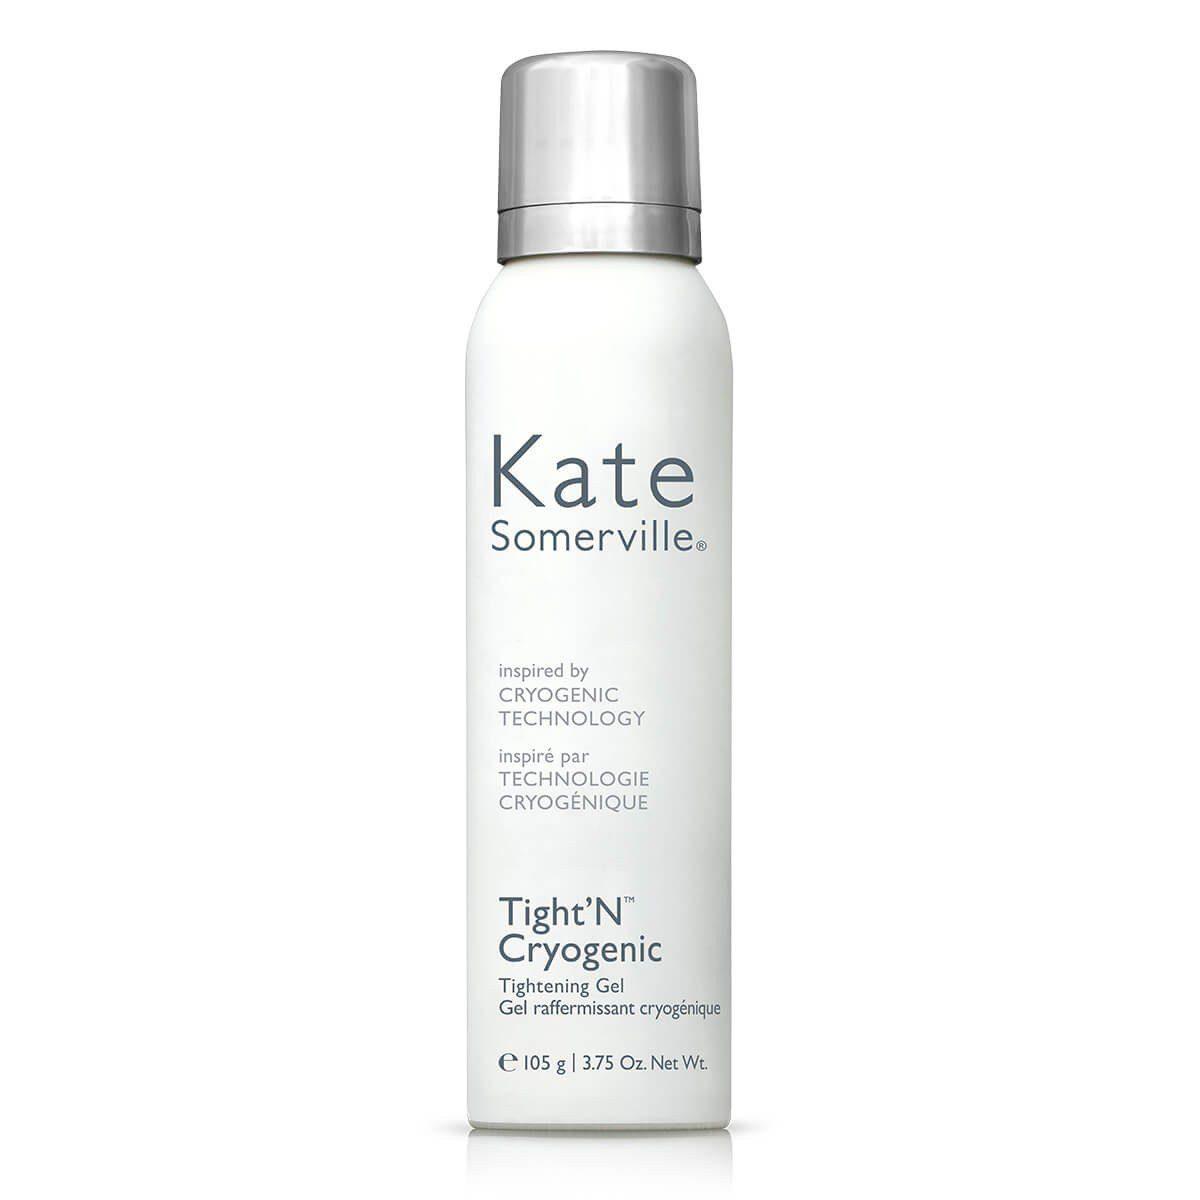 kate somerville-cryogenic-technology-gel-tightening-bottle